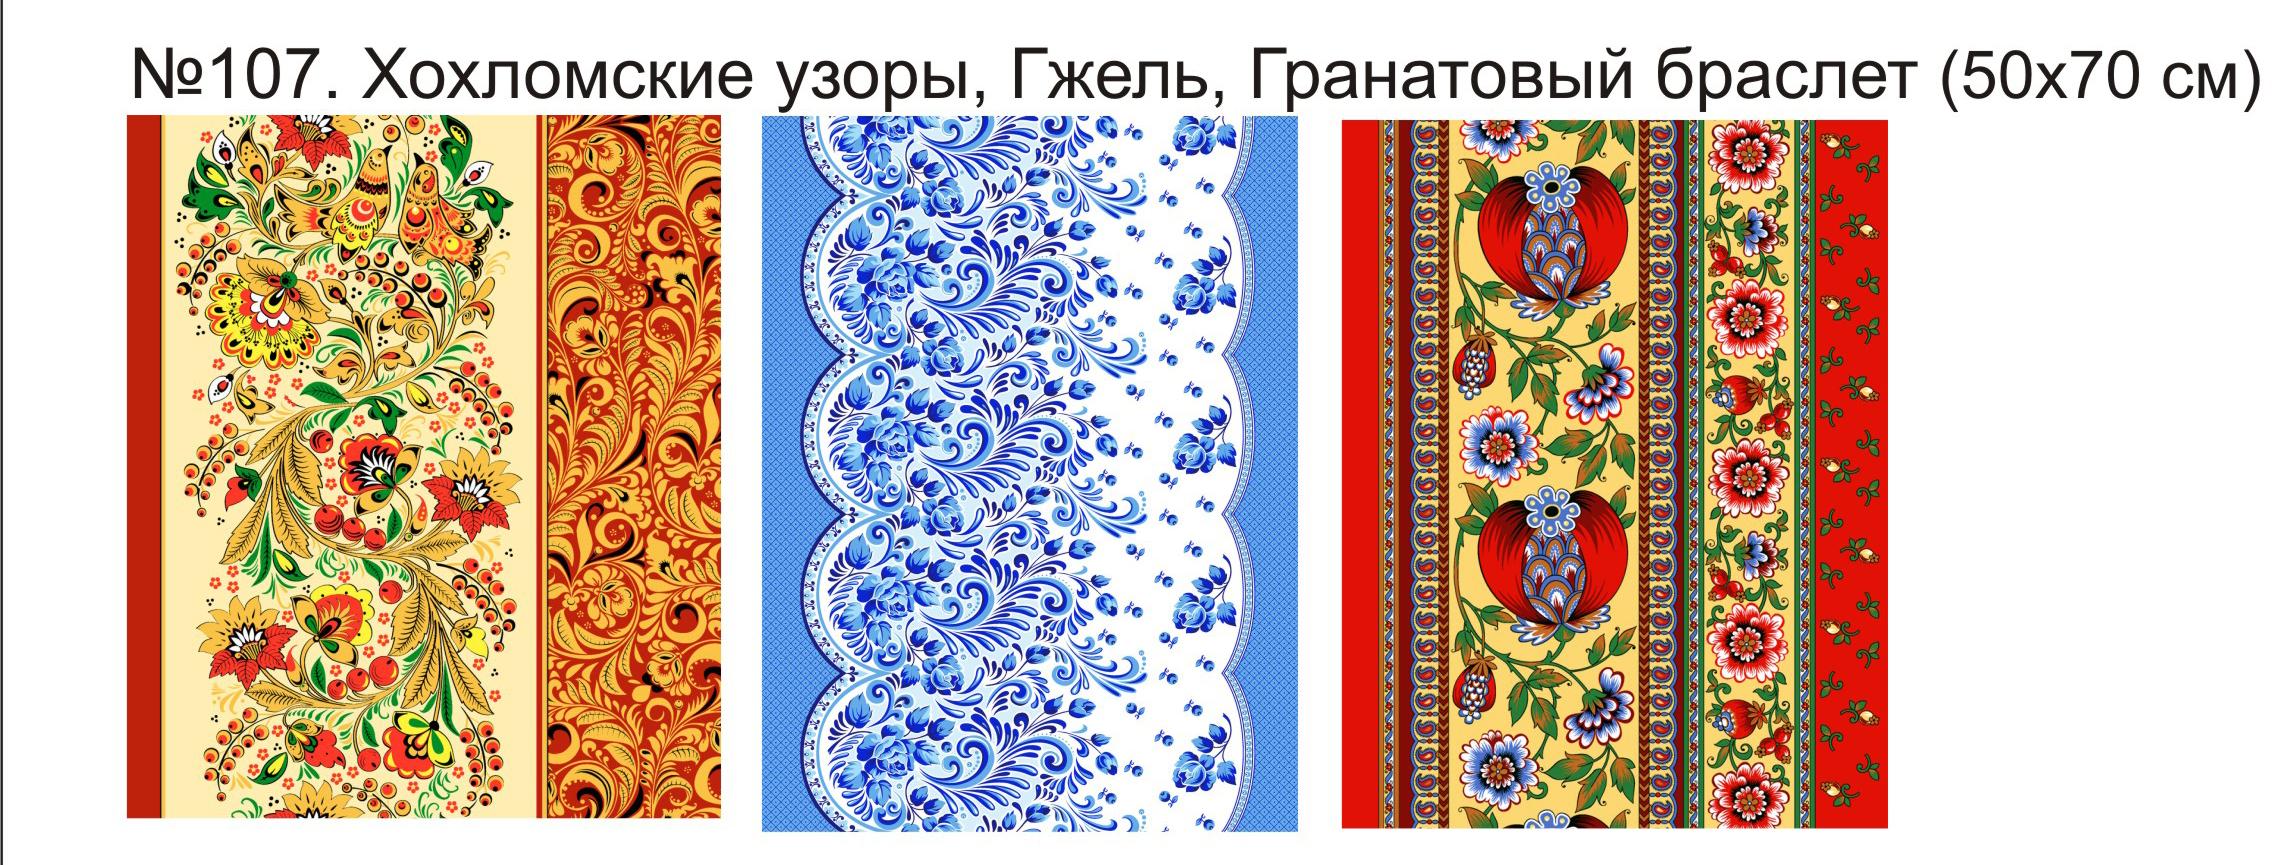 Набор вафельных полотенец Хохломские узоры, Гжель, Гранатовый браслетПолотенца<br><br><br>Размер: 50х70